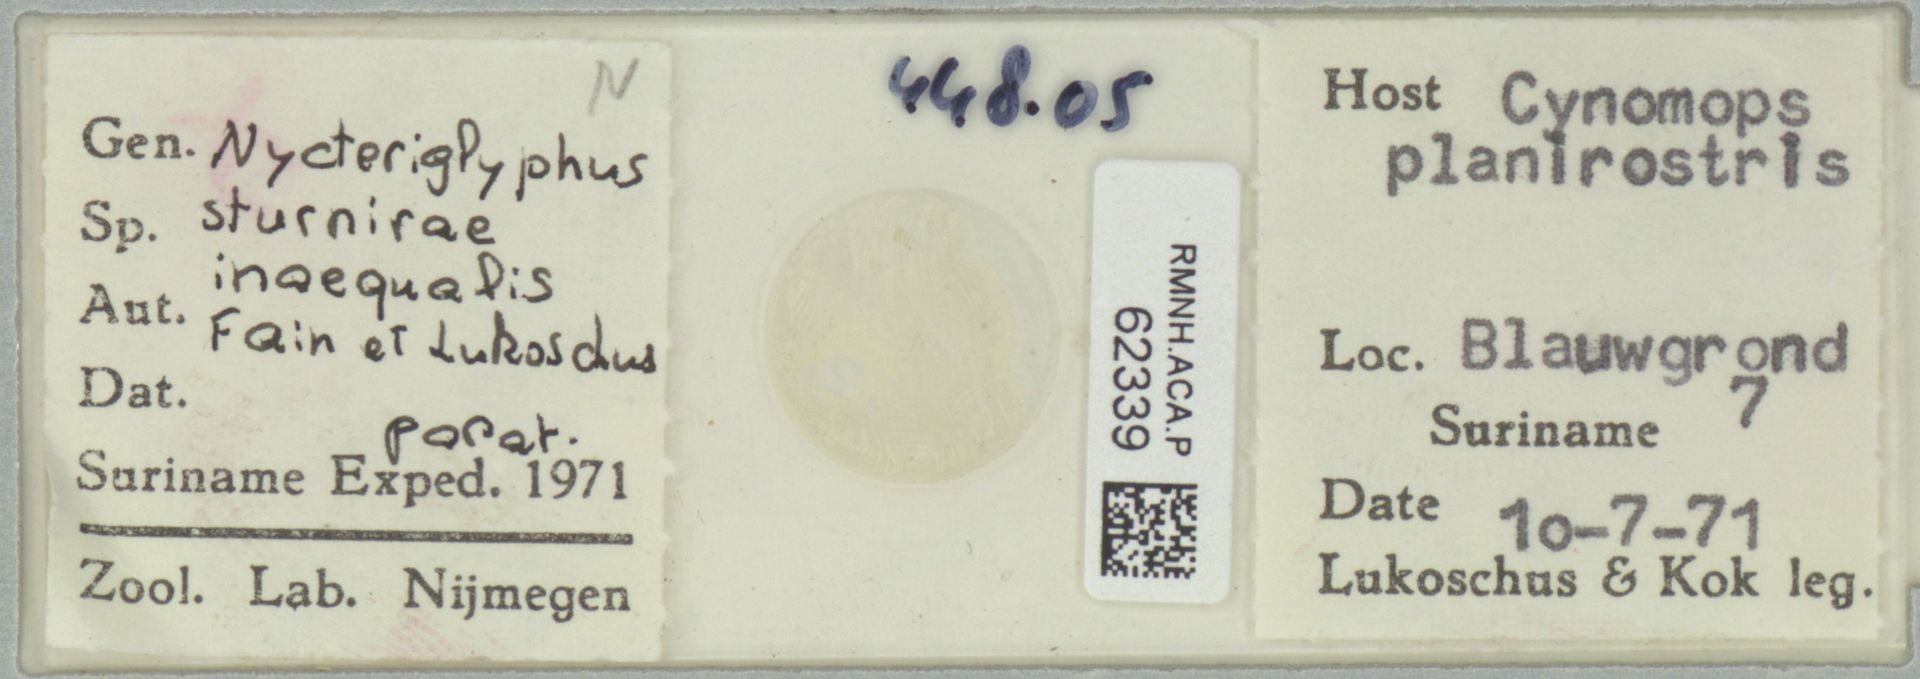 RMNH.ACA.P.62339 | Nycteriglyphites sturnirae inaequalis Fain et Lukoschus